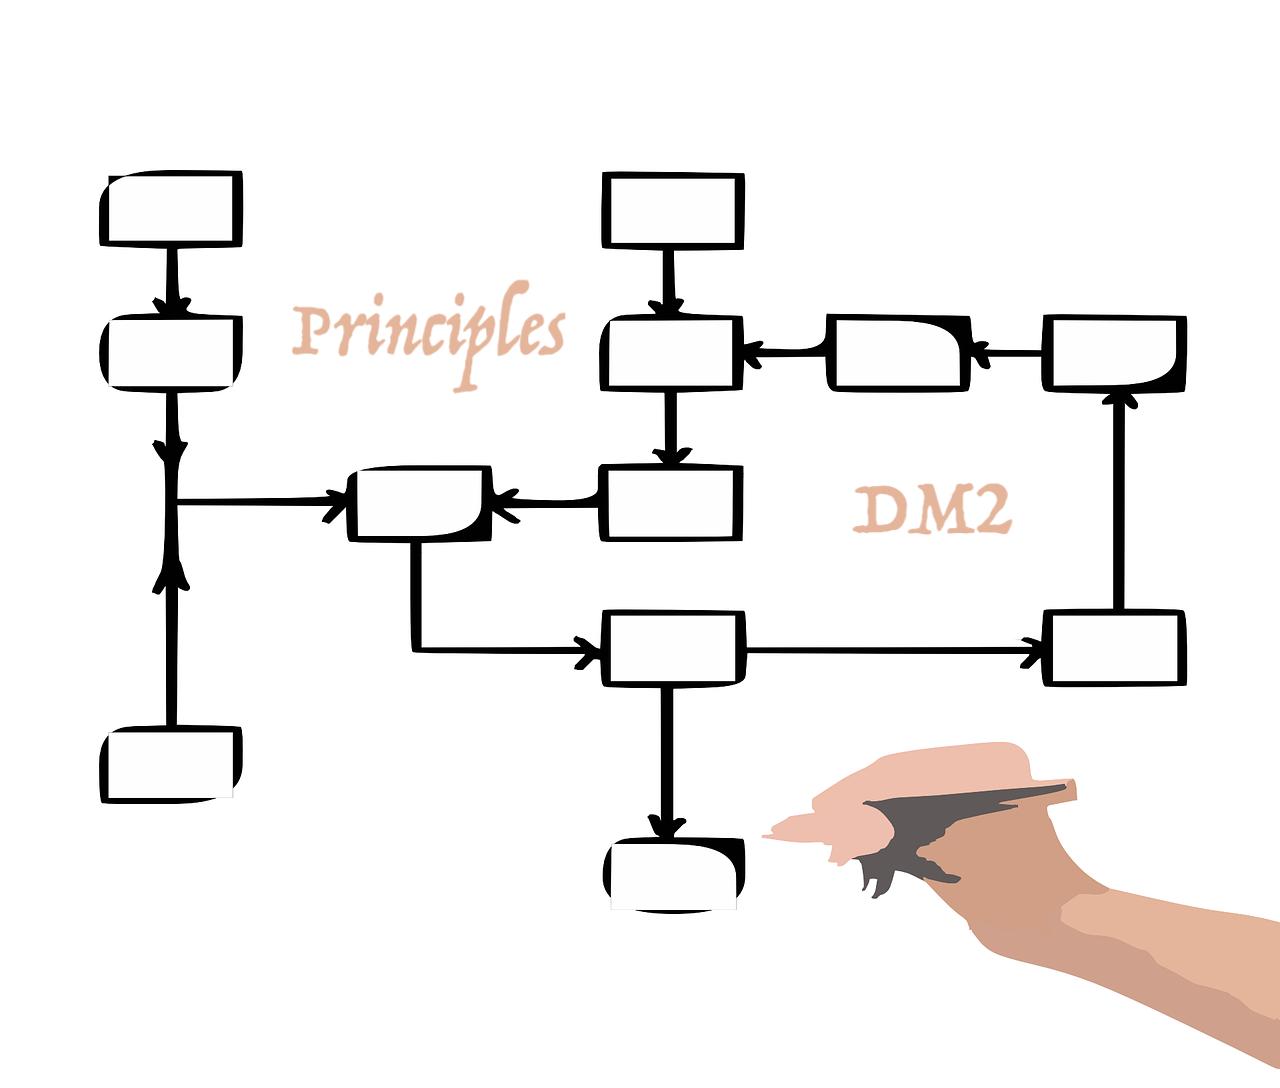 2019 Aace Guidelines Diabetes Type 2 Principles Gt Health Endocrinology Flow Chart Workflow Best Self